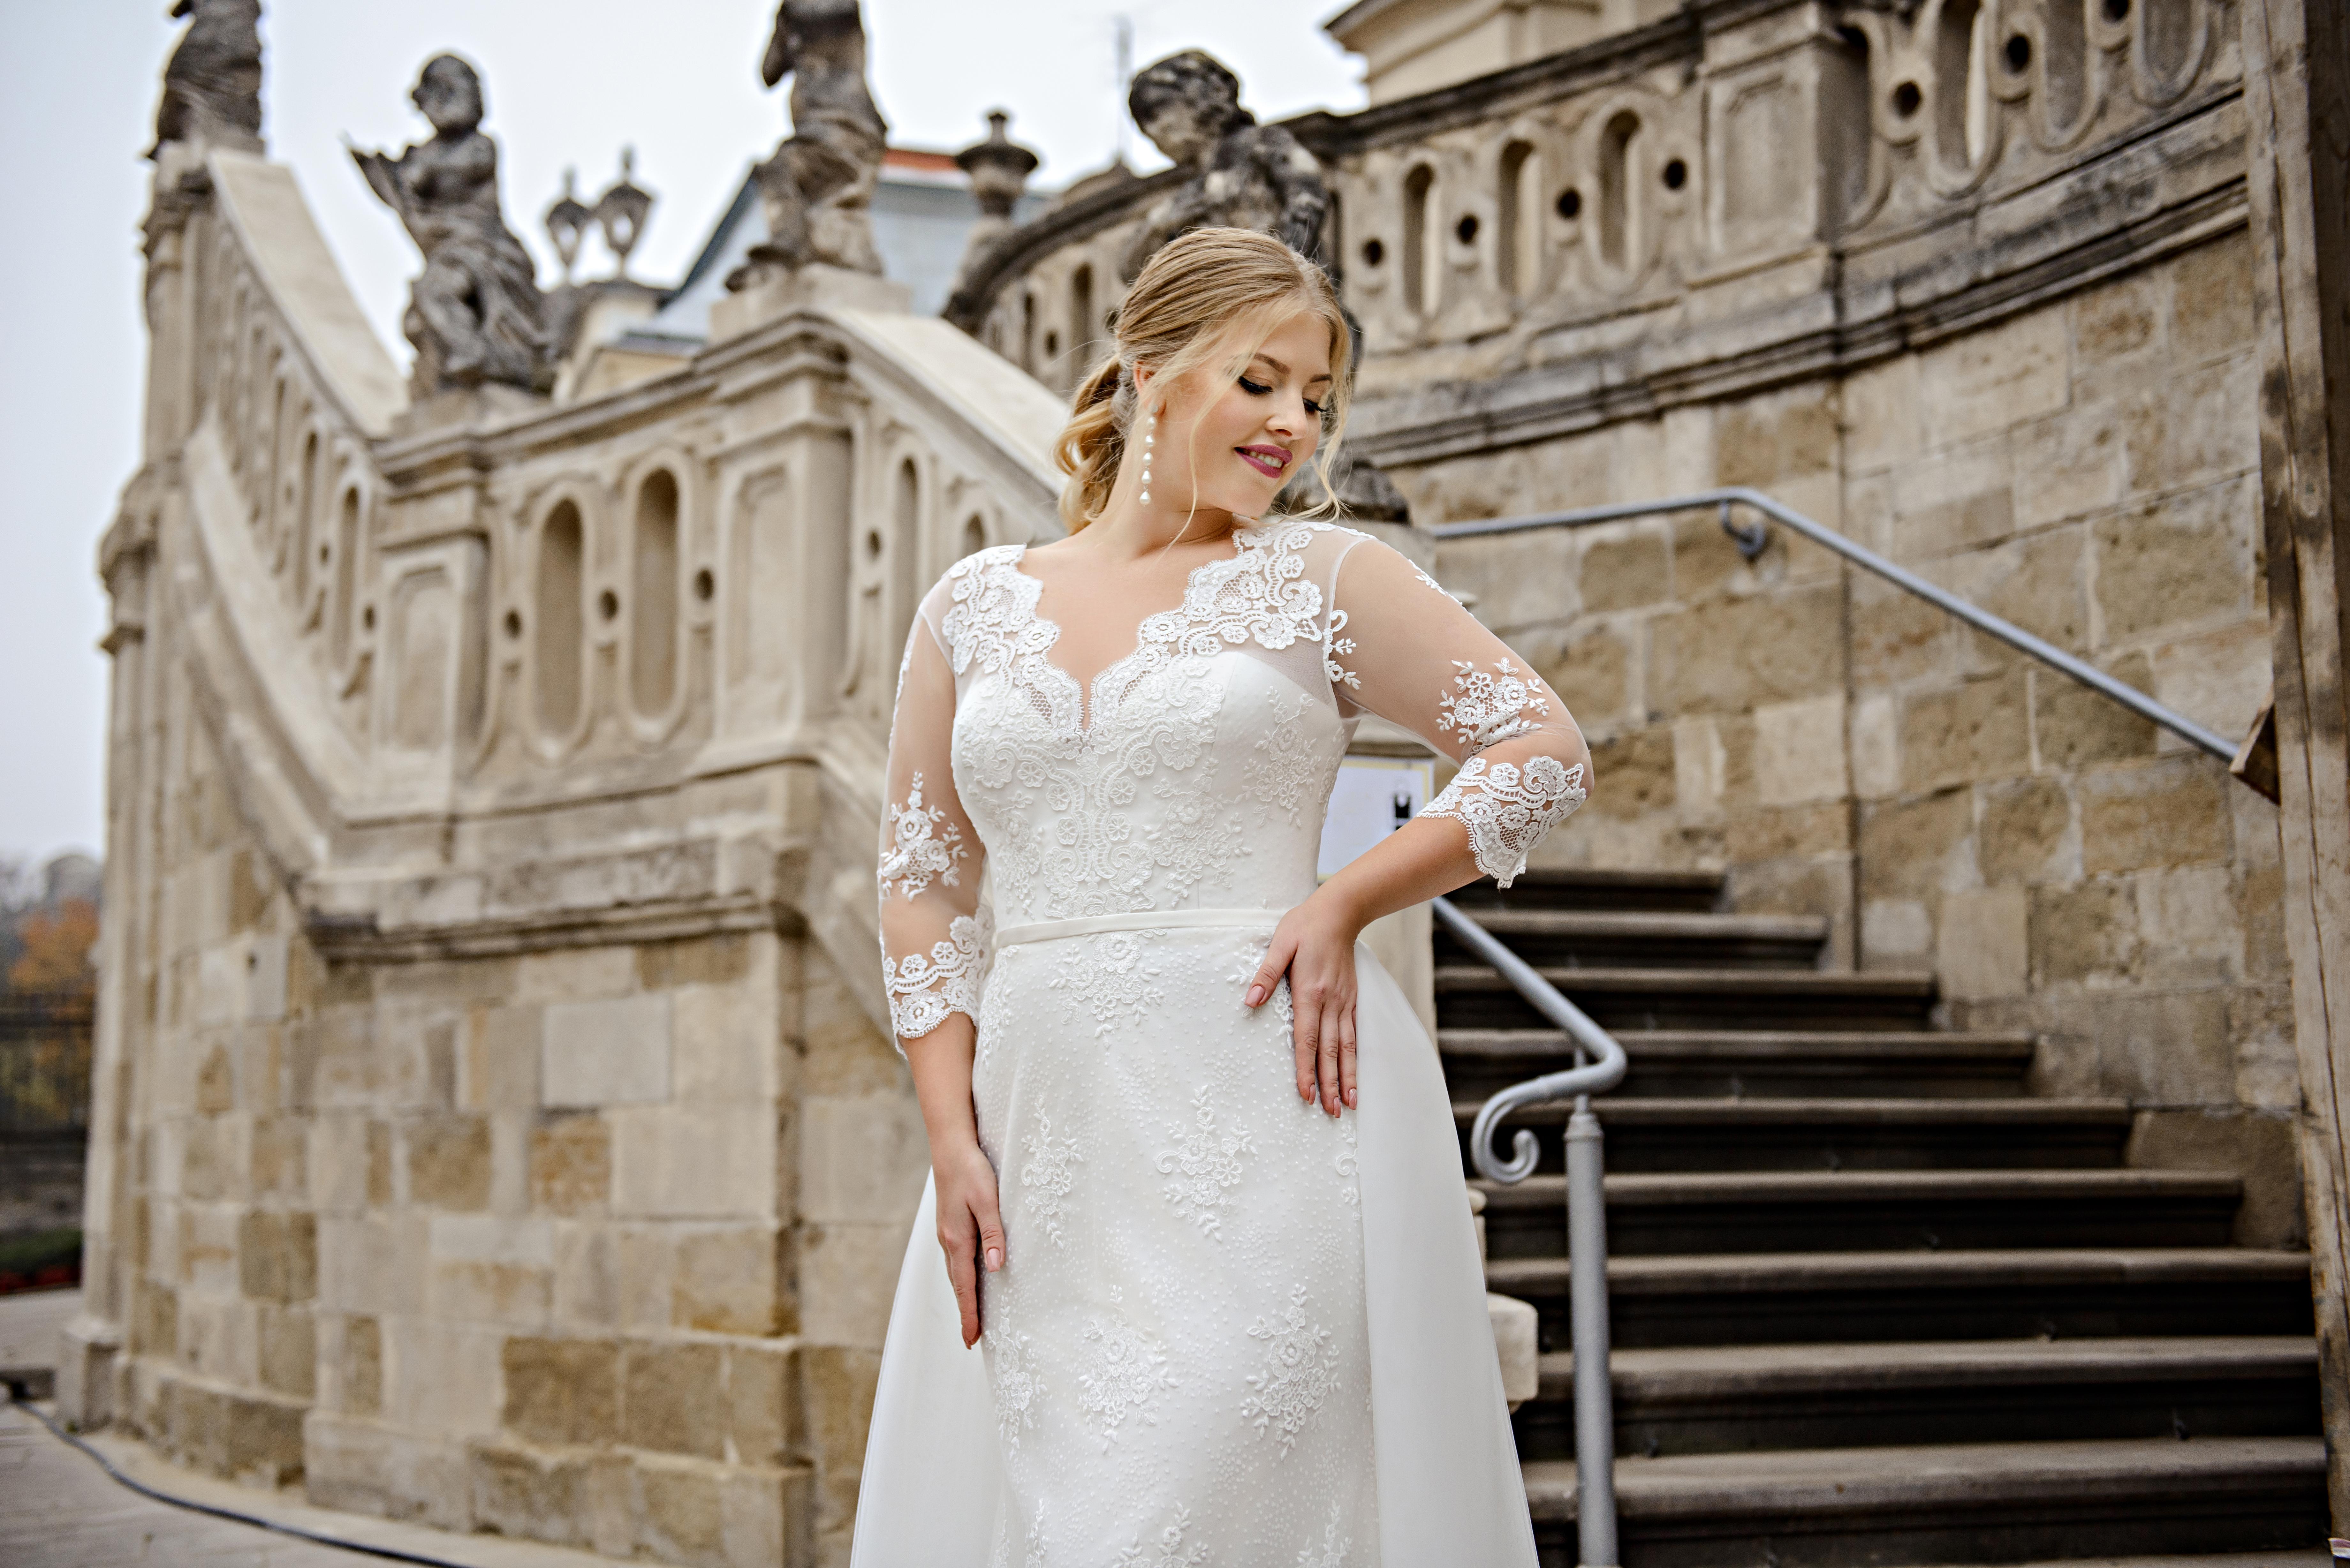 Plus size wedding dress transformer  on wholesale from SuperNova manufacturer-1